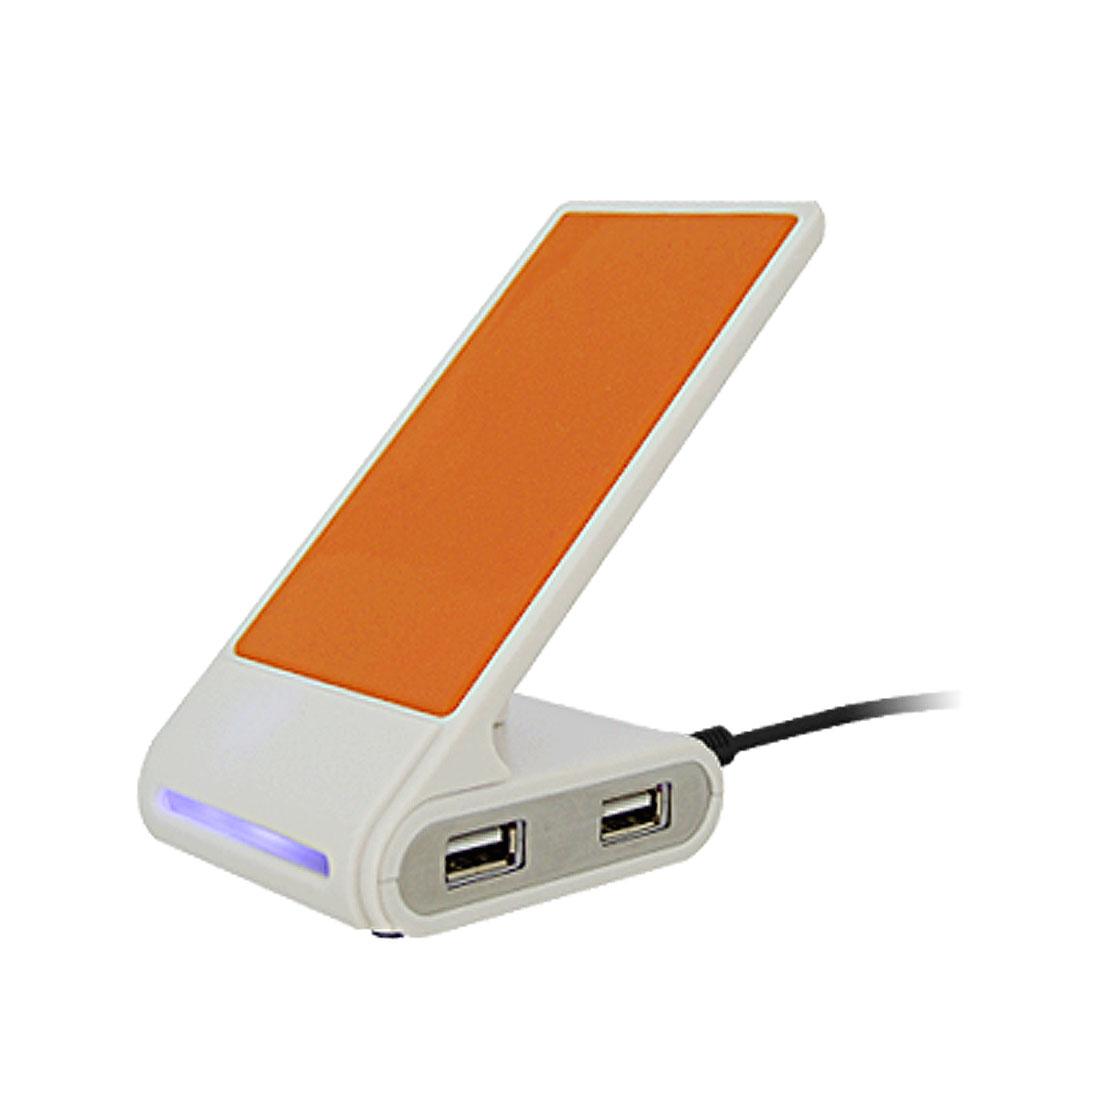 Orange Anti-slip Phone Holder Stand w/ 4 Ports USB Hub